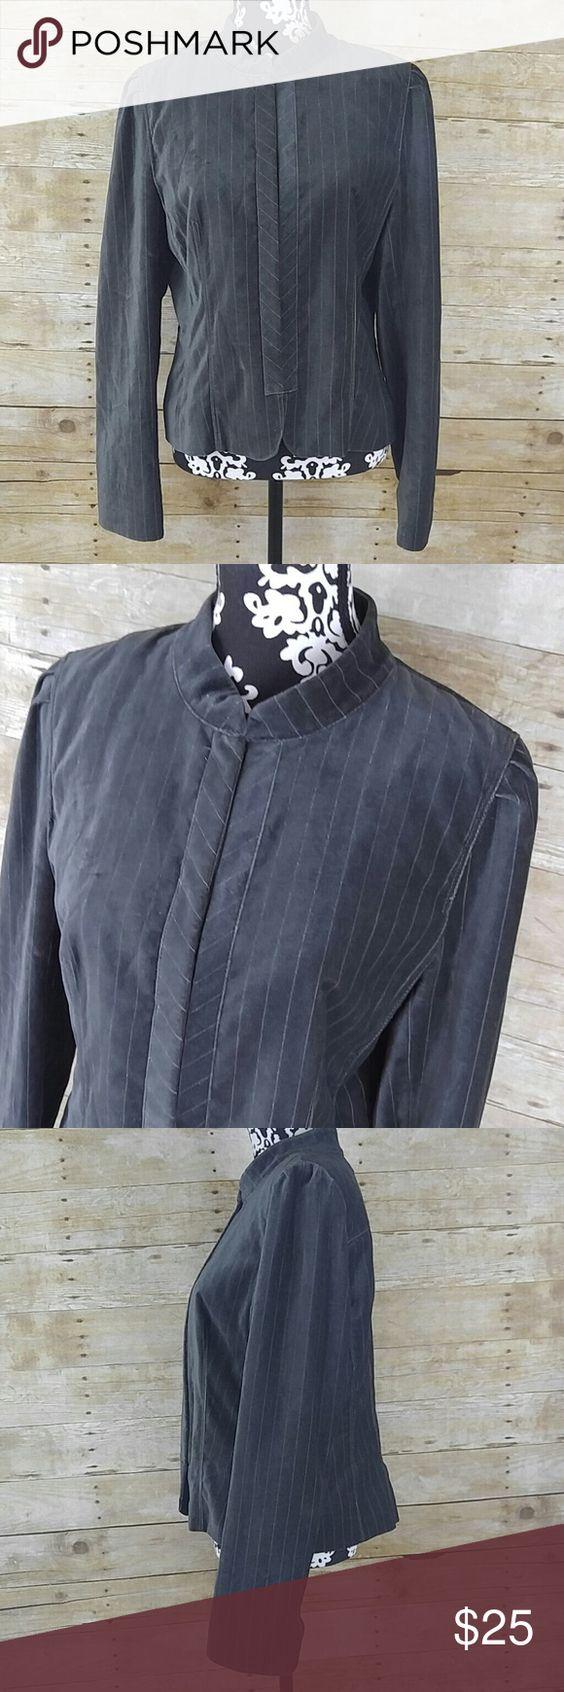 "Ann Taylor LOFT Velvet Blazer Jacket Ann Taylor LOFT Blazer Jacket? Velvet like feel Gray with metallic pin stripes? Hook closure? Lined? 74% cotton, 25% lyocell, 1% other fibers? Size 12? Worn once or twice EUC?  Measurements laying flat:? Shoulder to shoulder: 15.5""? Underarm to underarm: 20""? Length: 24.5""? Waist: 17"" LOFT Jackets & Coats"